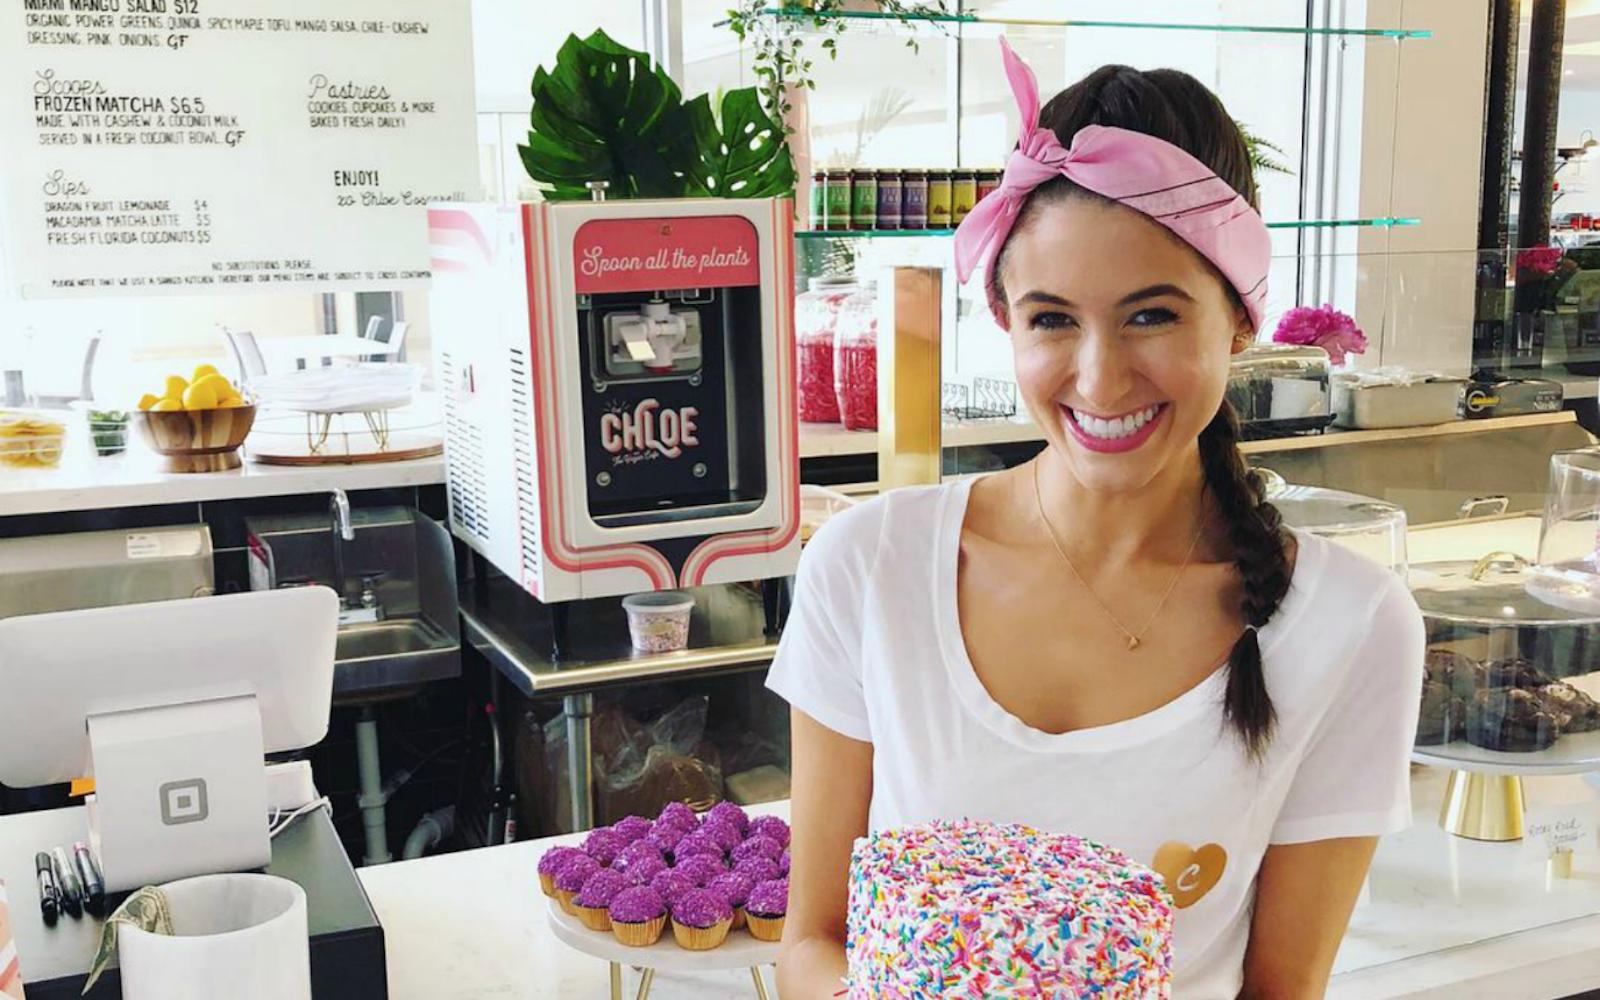 Chef Chloe Coscarelli To Open New Vegan Restaurant In Miami Chef Chloe Vegan Restaurants Vegan Cafe